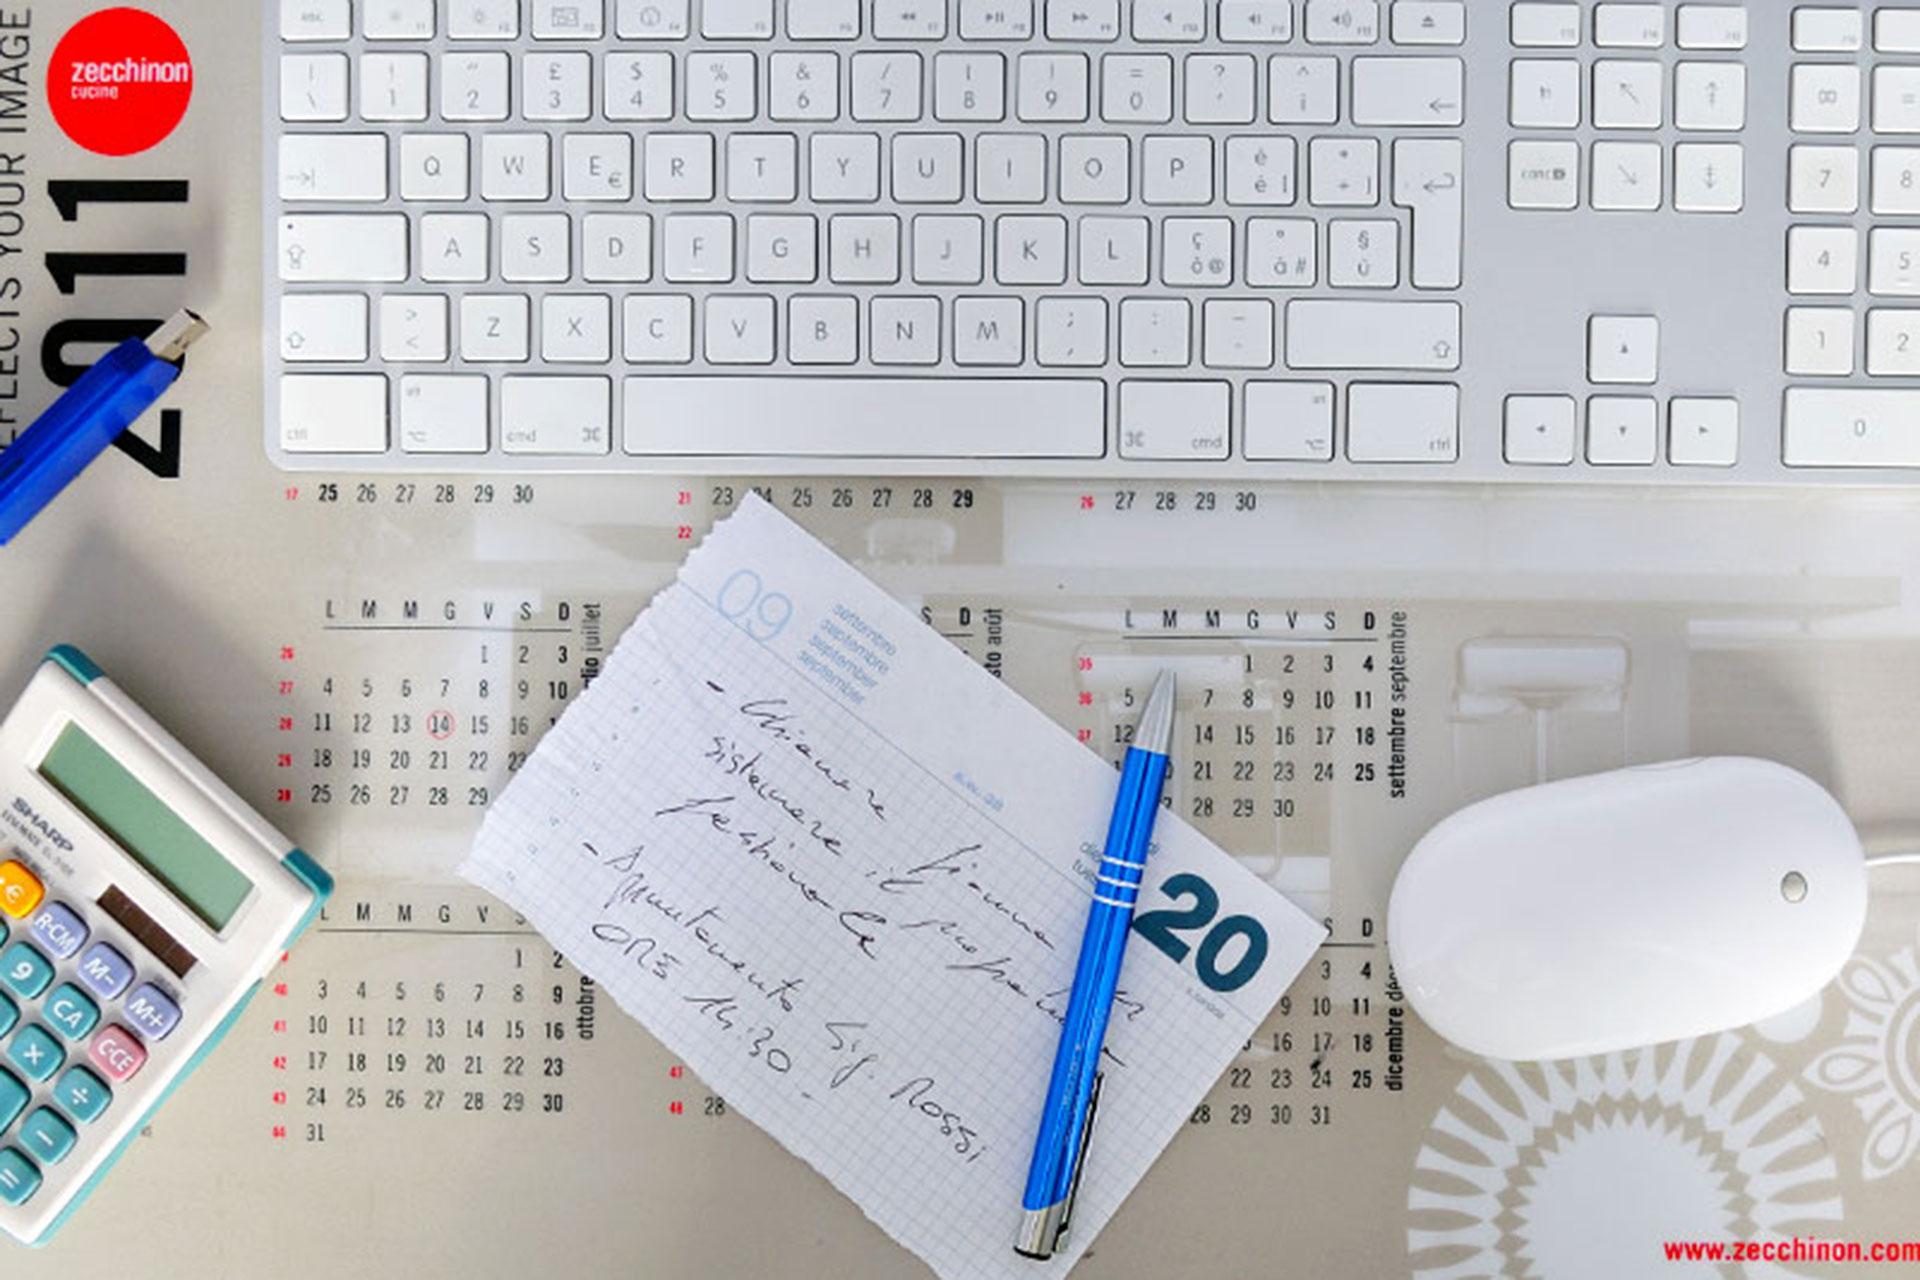 Pad da scrivania gadget aziendale